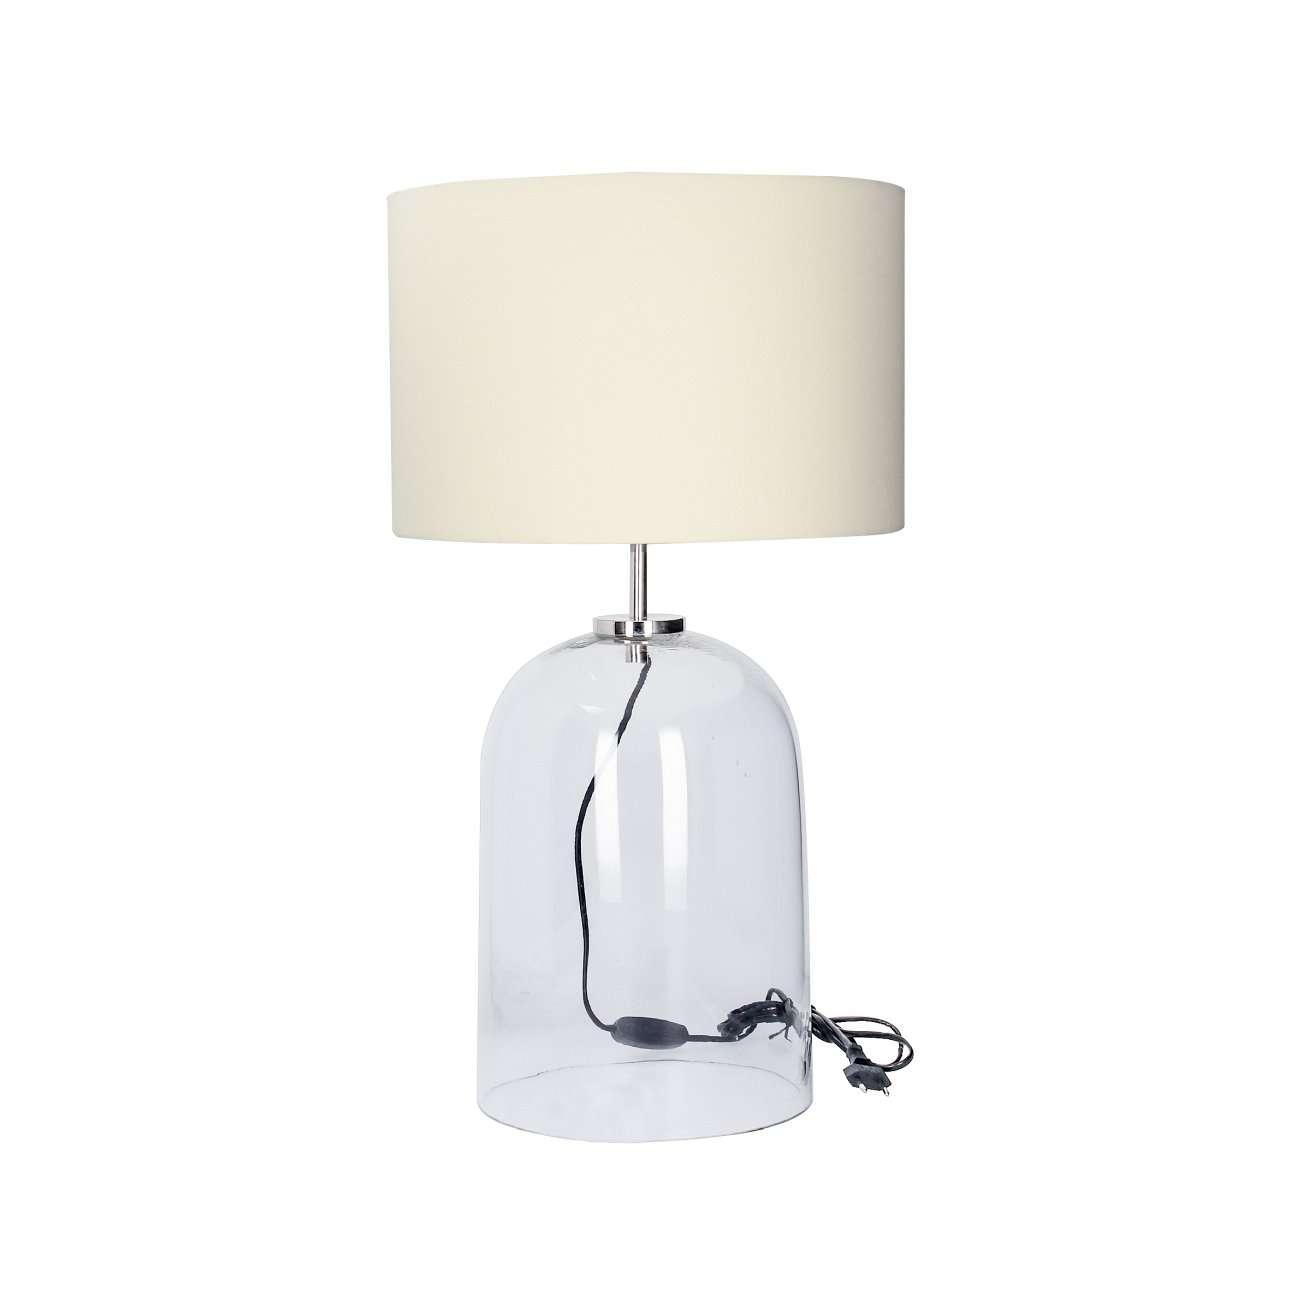 Lampa Pure Glass výška 64cm